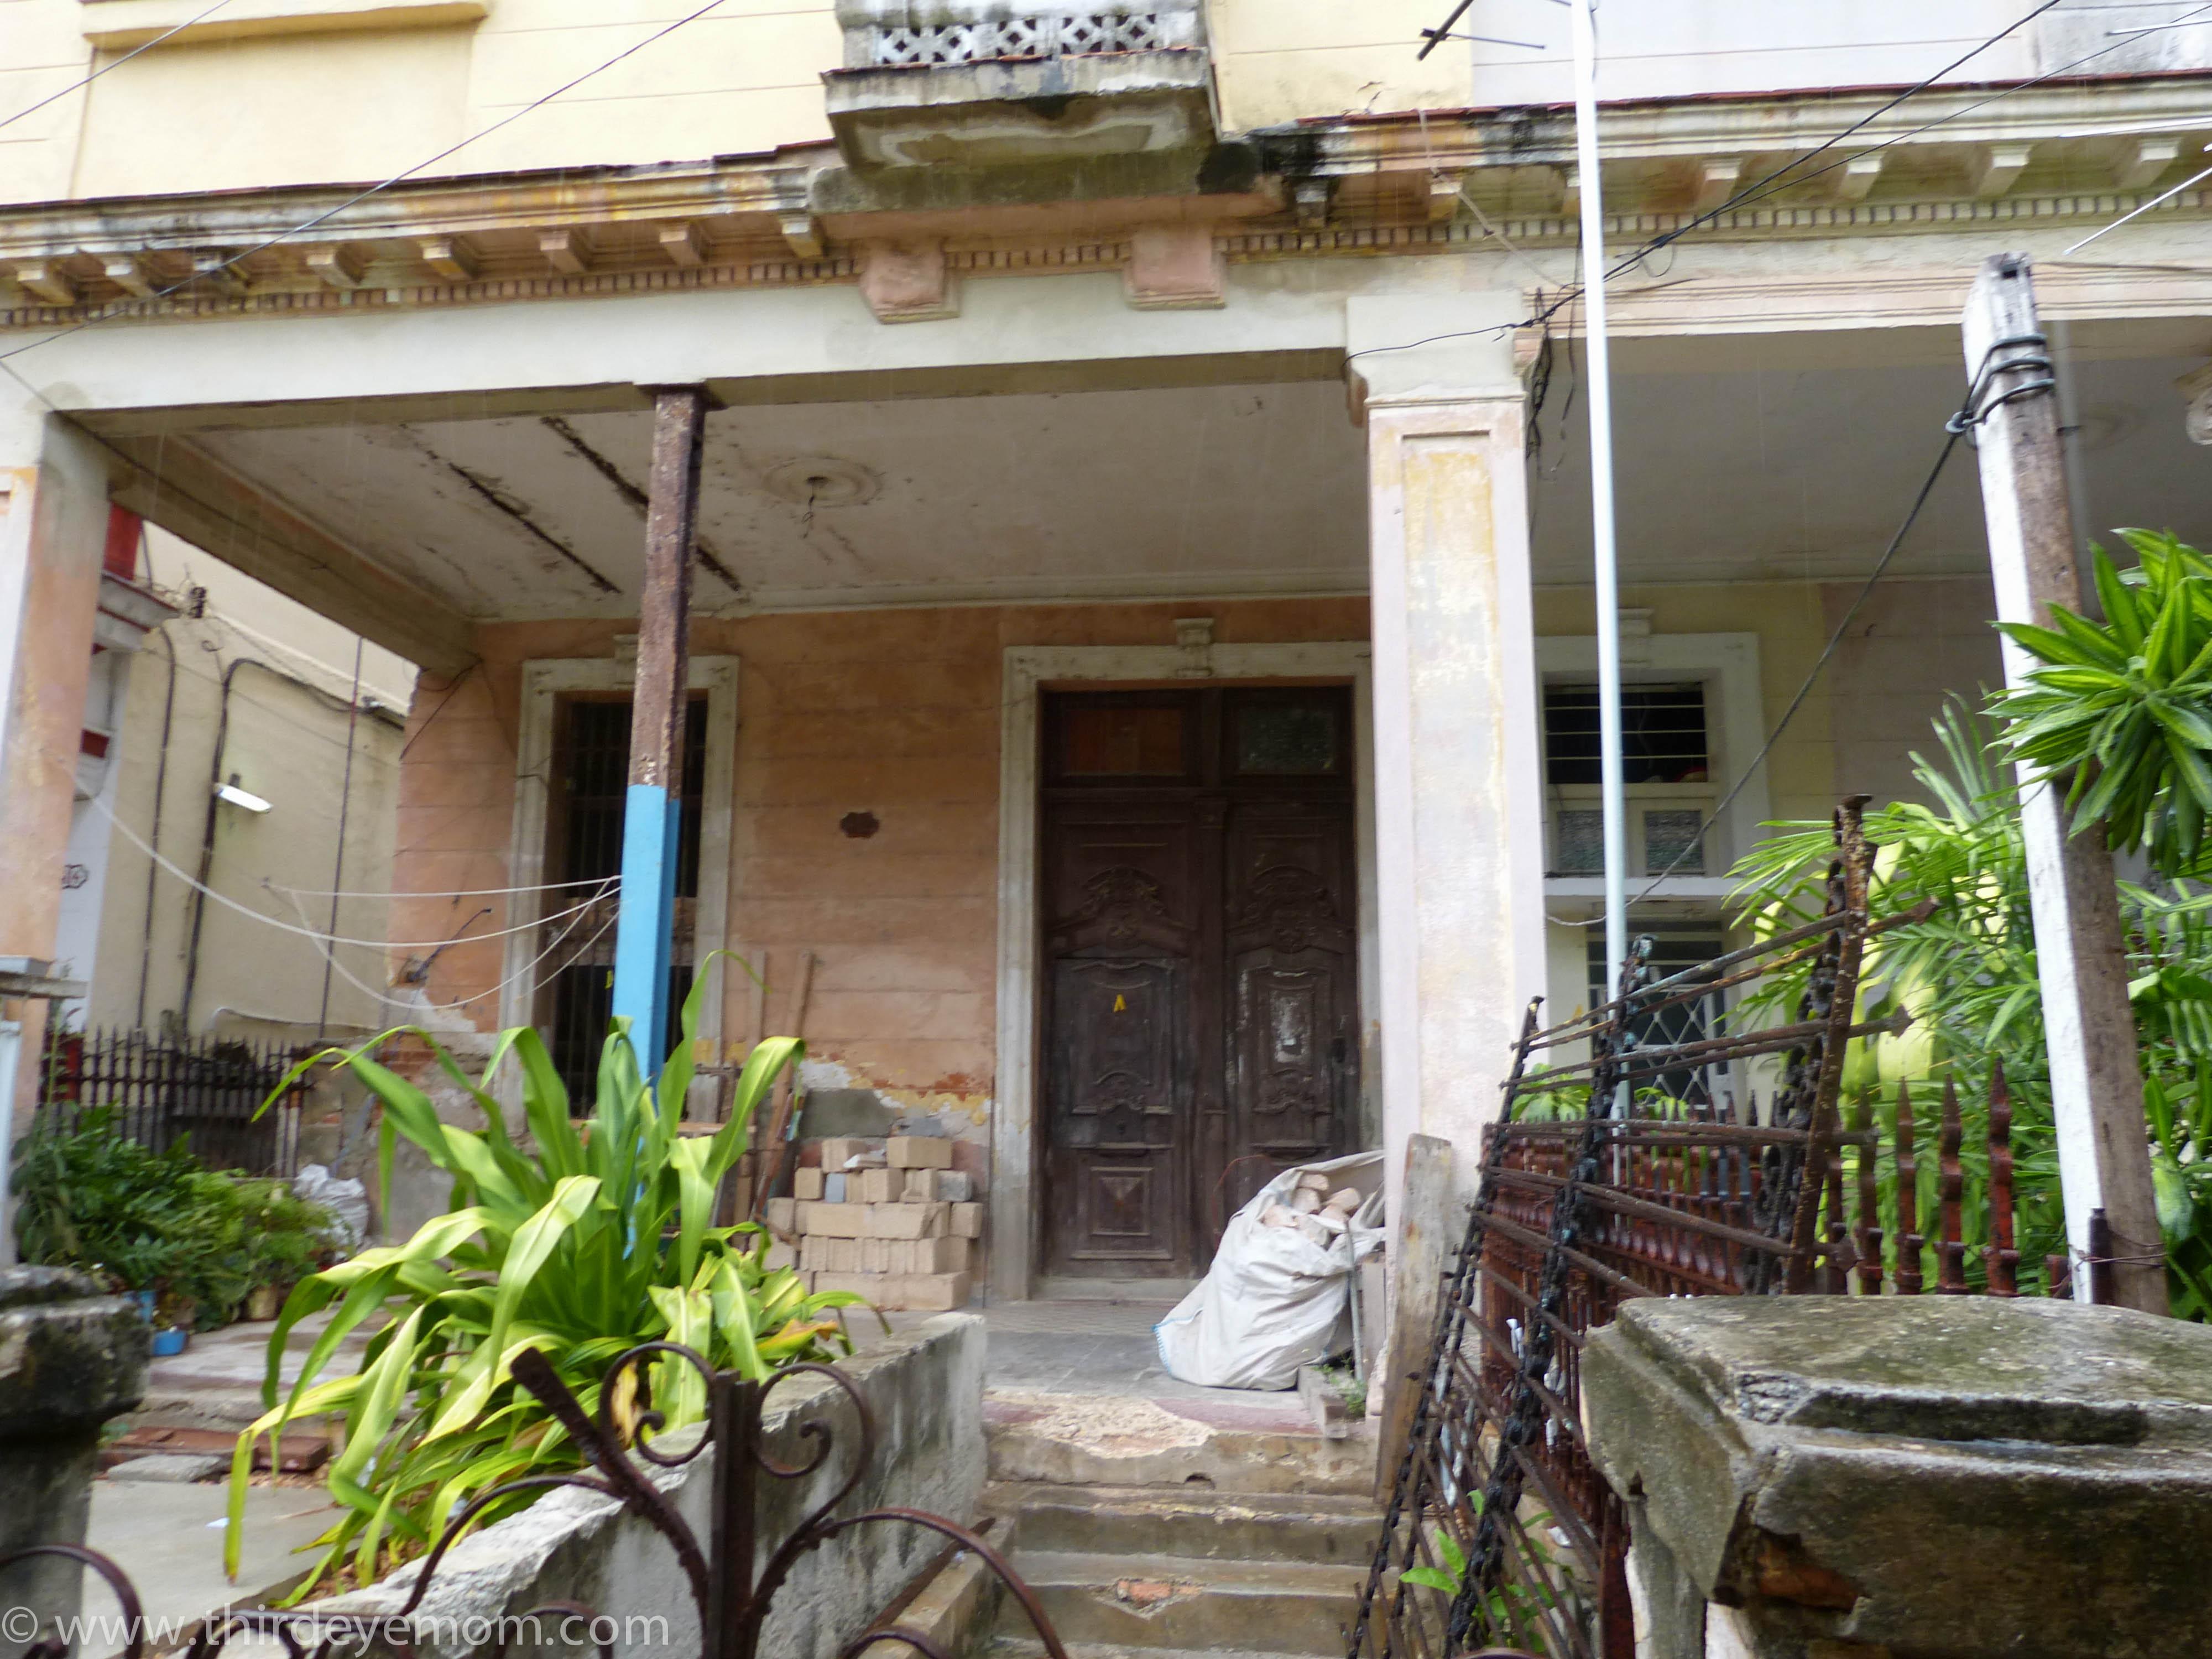 Vedado neighborhood, Havana